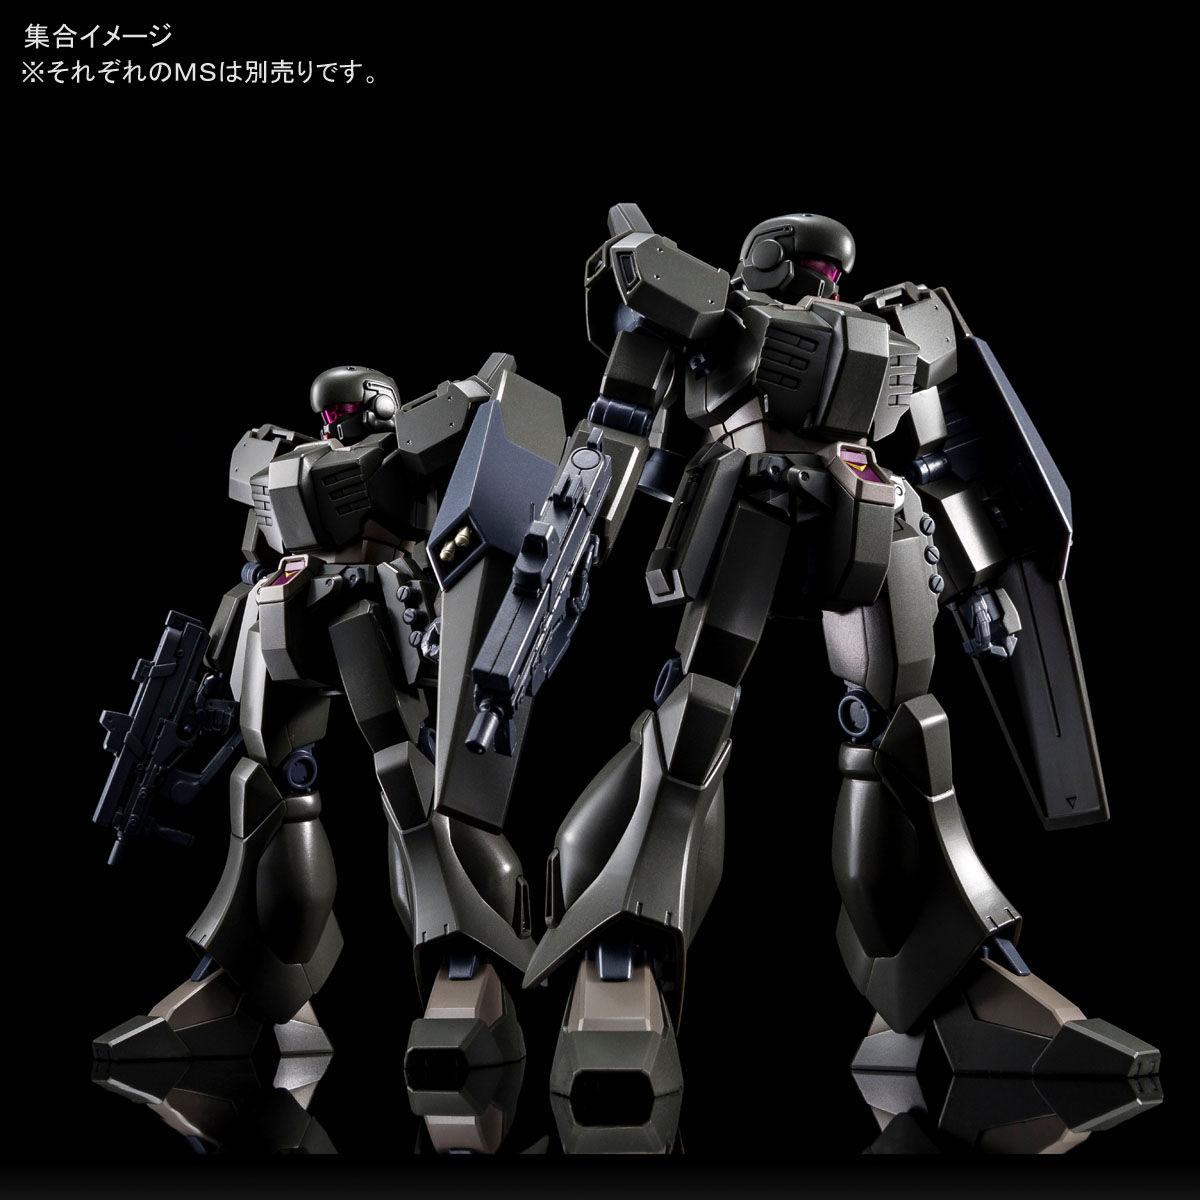 HG 1/144『ジェガンD型 (護衛隊仕様)』機動戦士ガンダムNT プラモデル-008